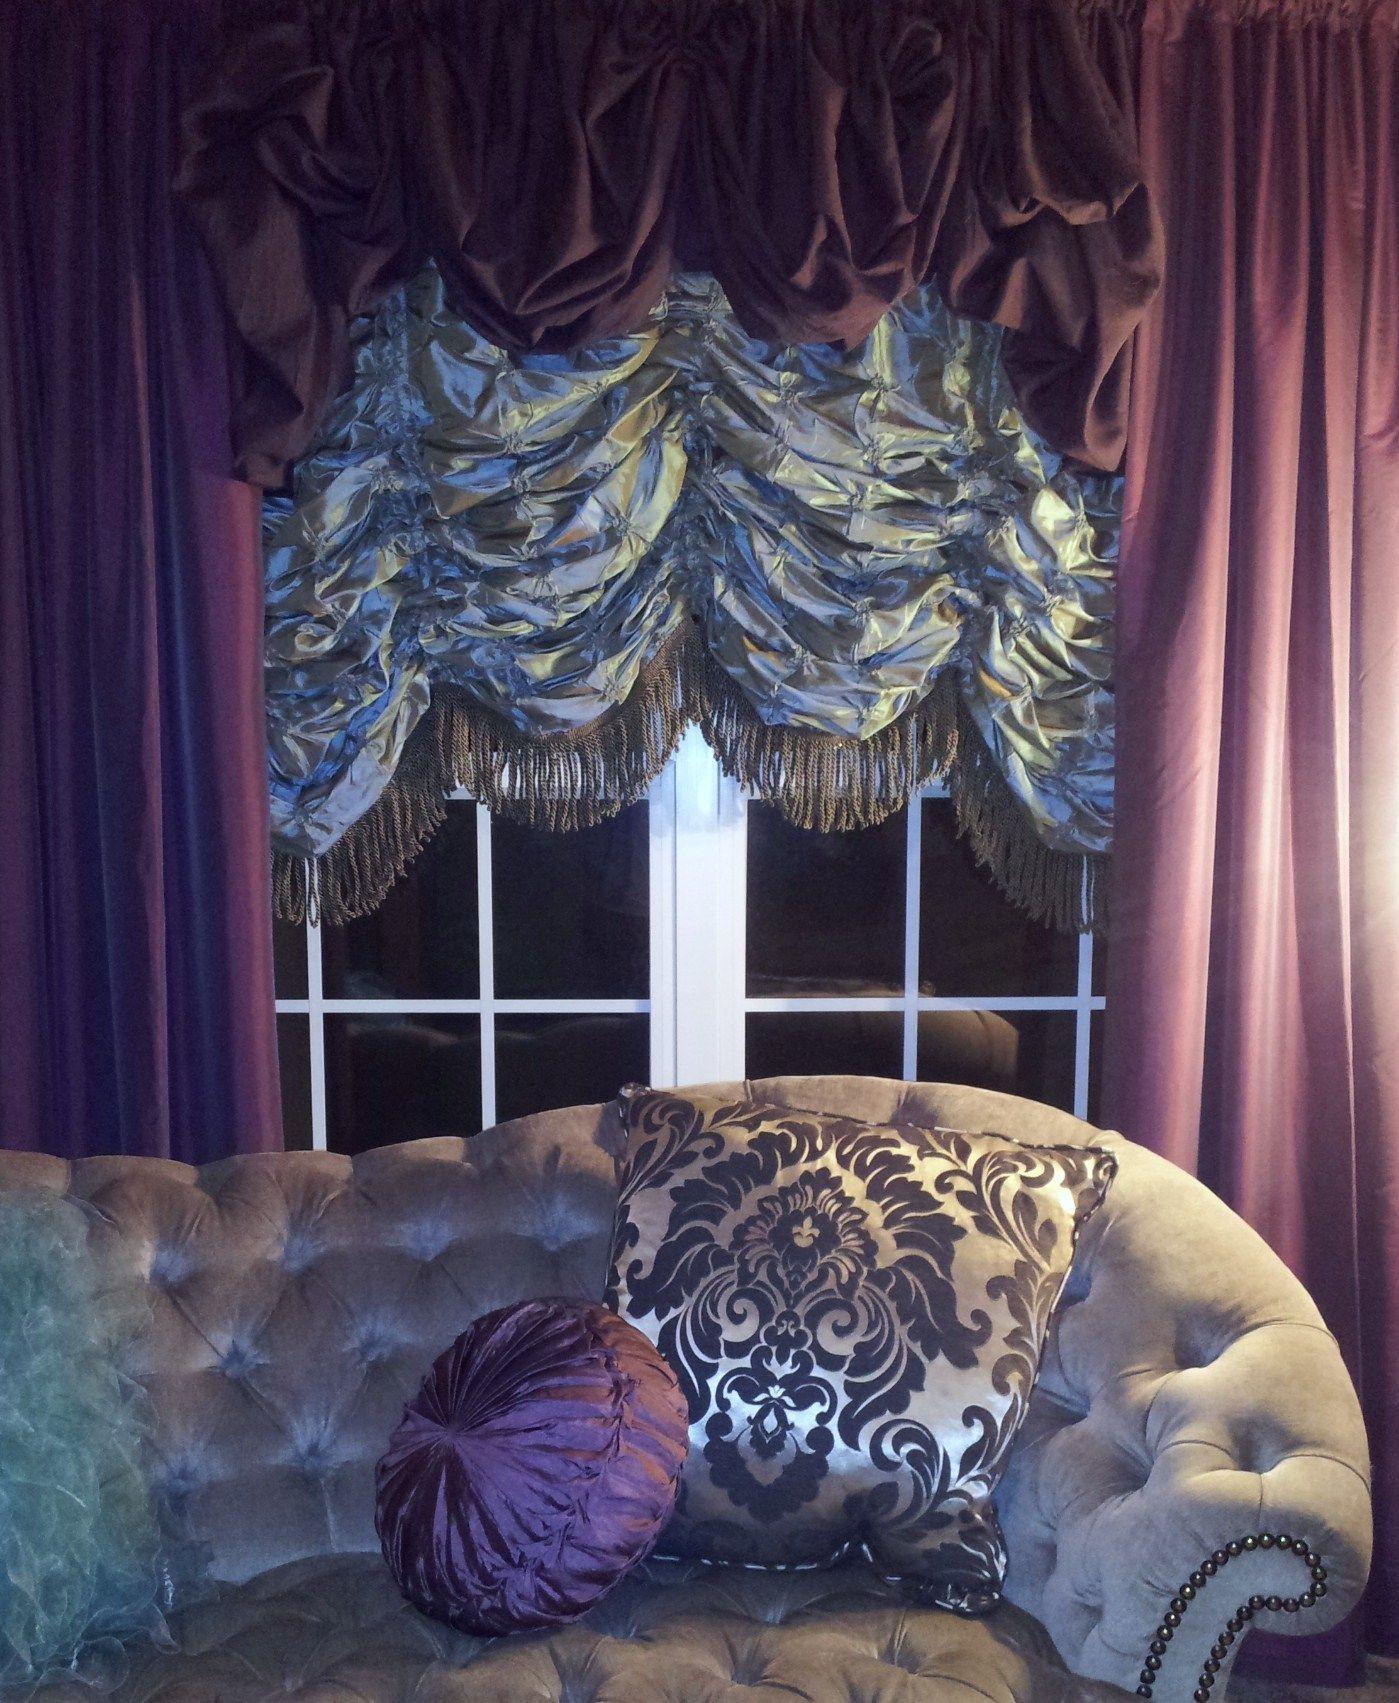 bay window valance ideas curtain ideas austrian shades with velvet drapery overtop idea is very cute but diff colors